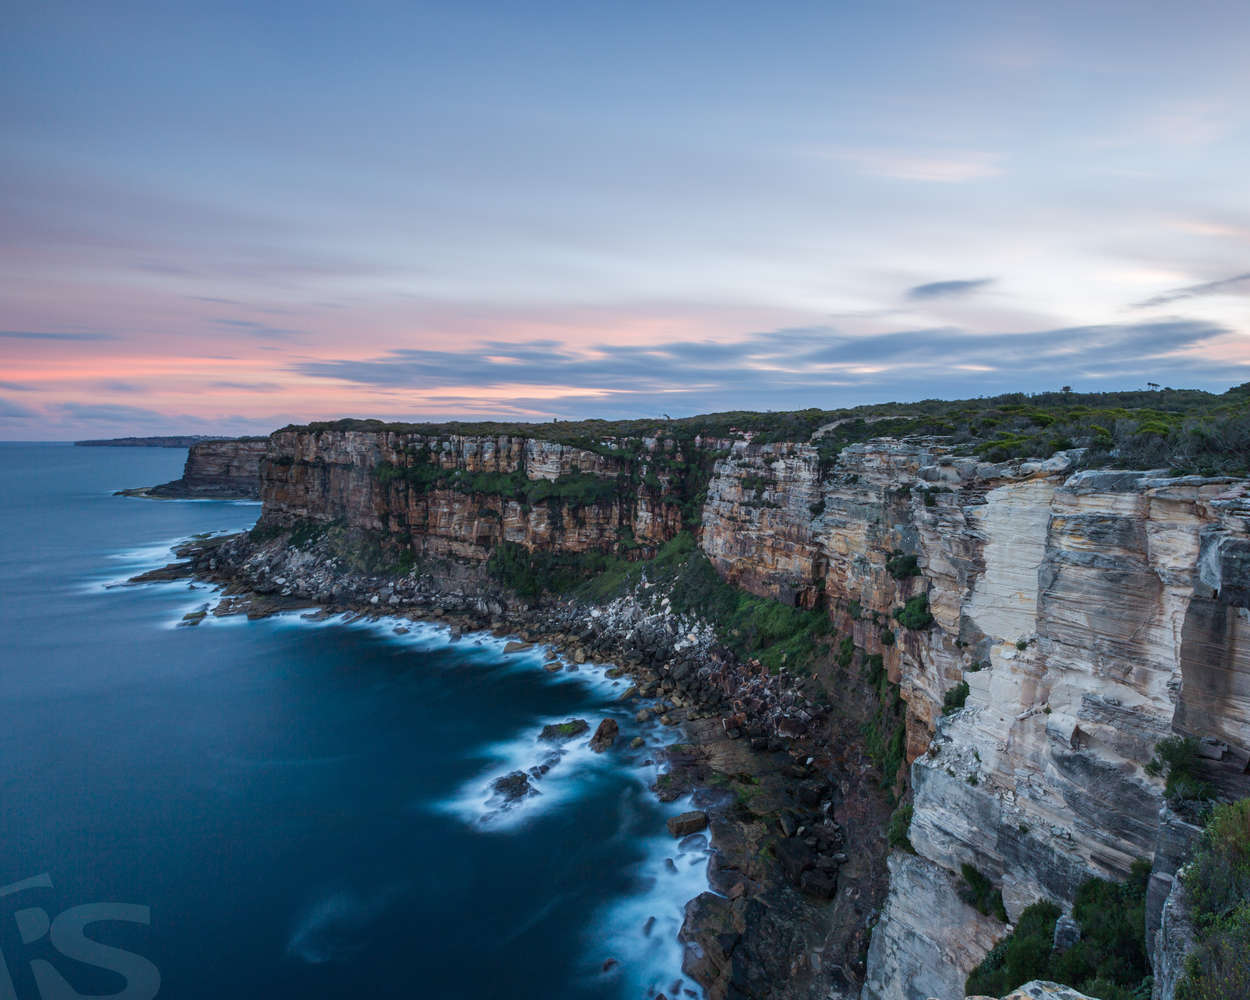 CLIFFS OF AUSTRALIA